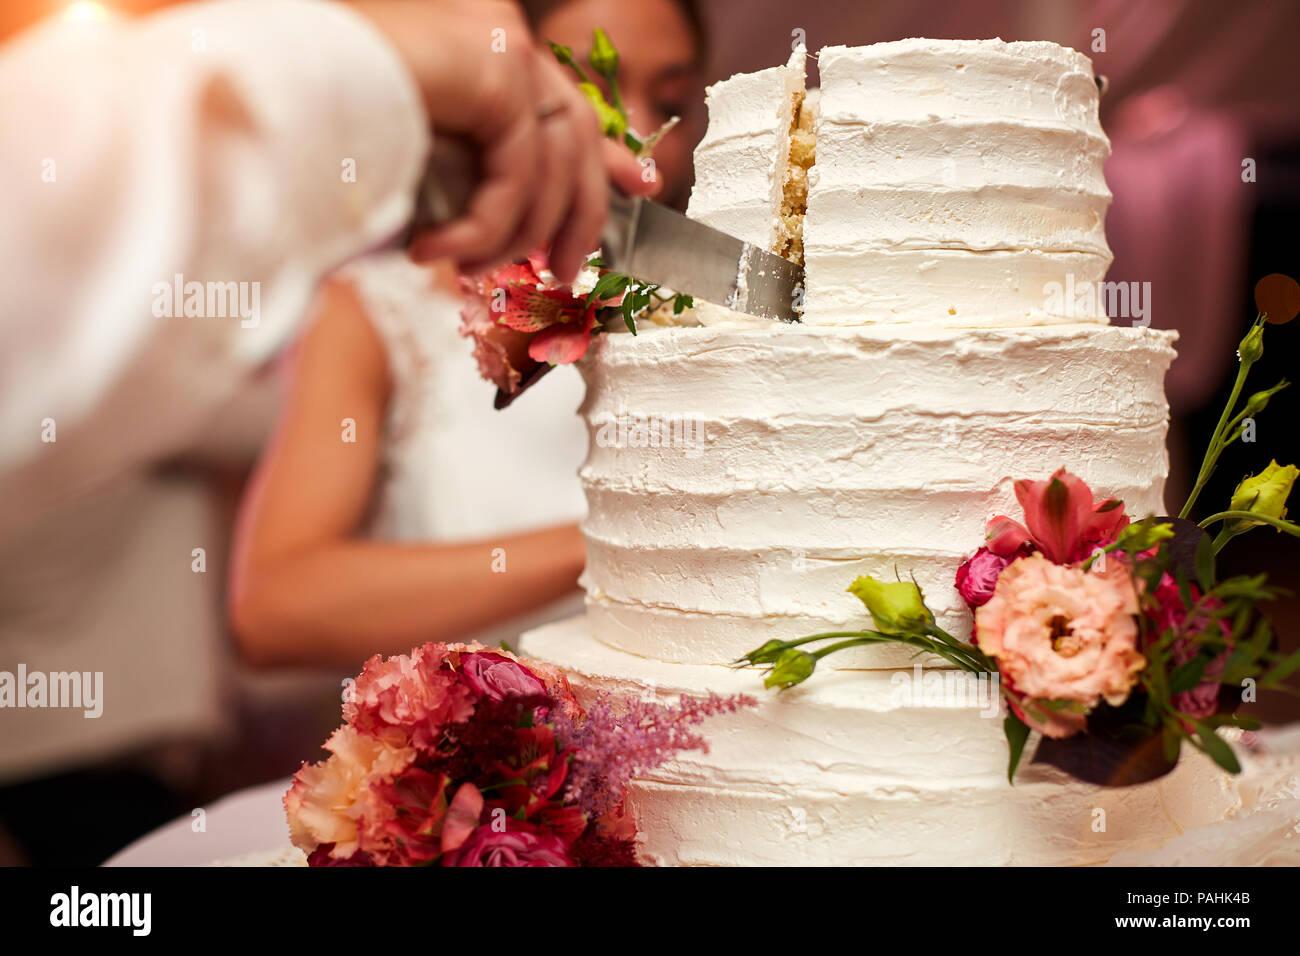 groom cuts the wedding cake Stock Photo